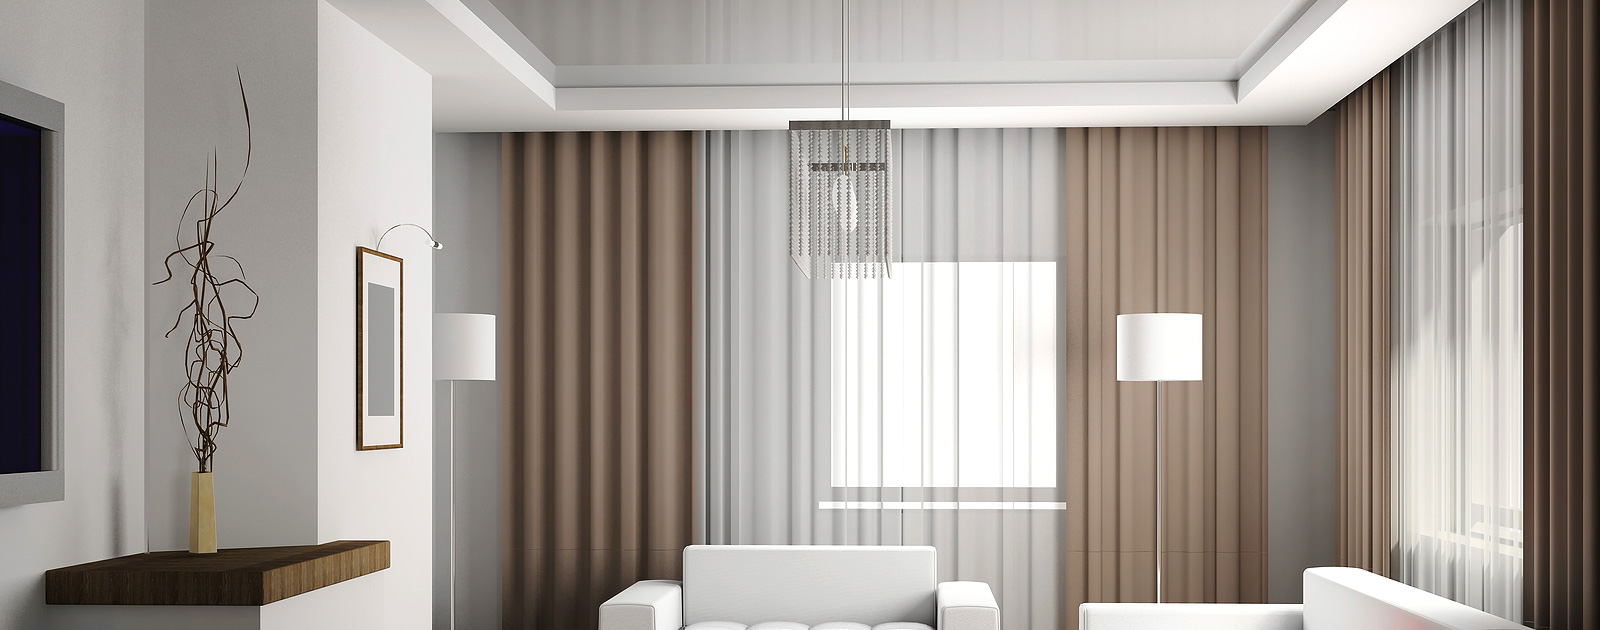 menuiserie int rieure ext rieure cloison plafond. Black Bedroom Furniture Sets. Home Design Ideas